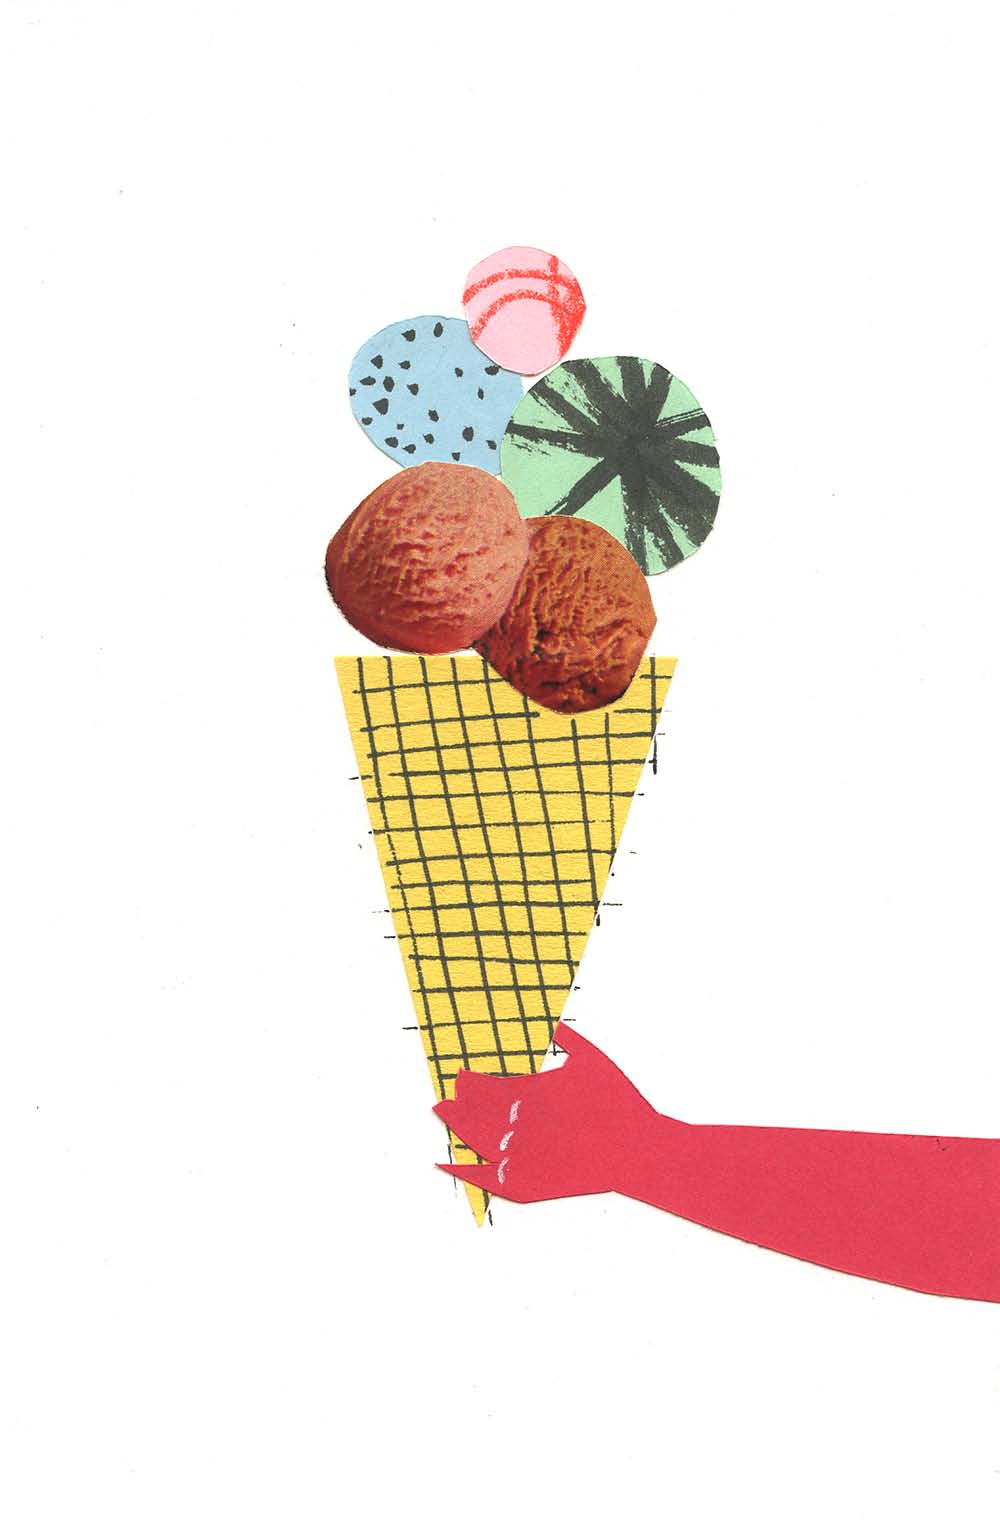 Ice Cream Treat - NN148